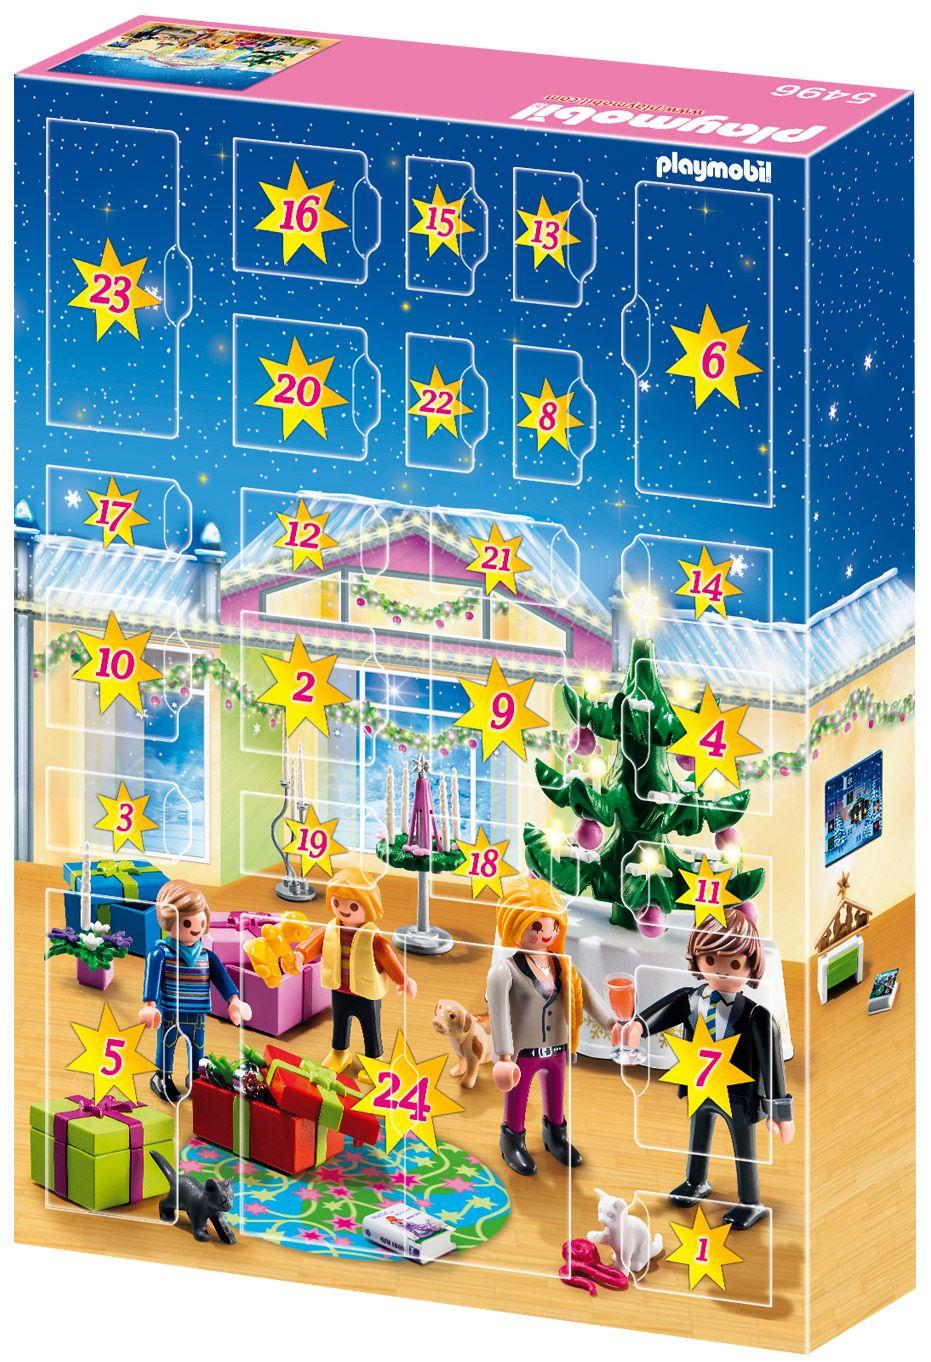 Calendrier De L Avent Playmobil Pas Cher.Https Www Koupobol Com Playmobil Christmas C18 Https